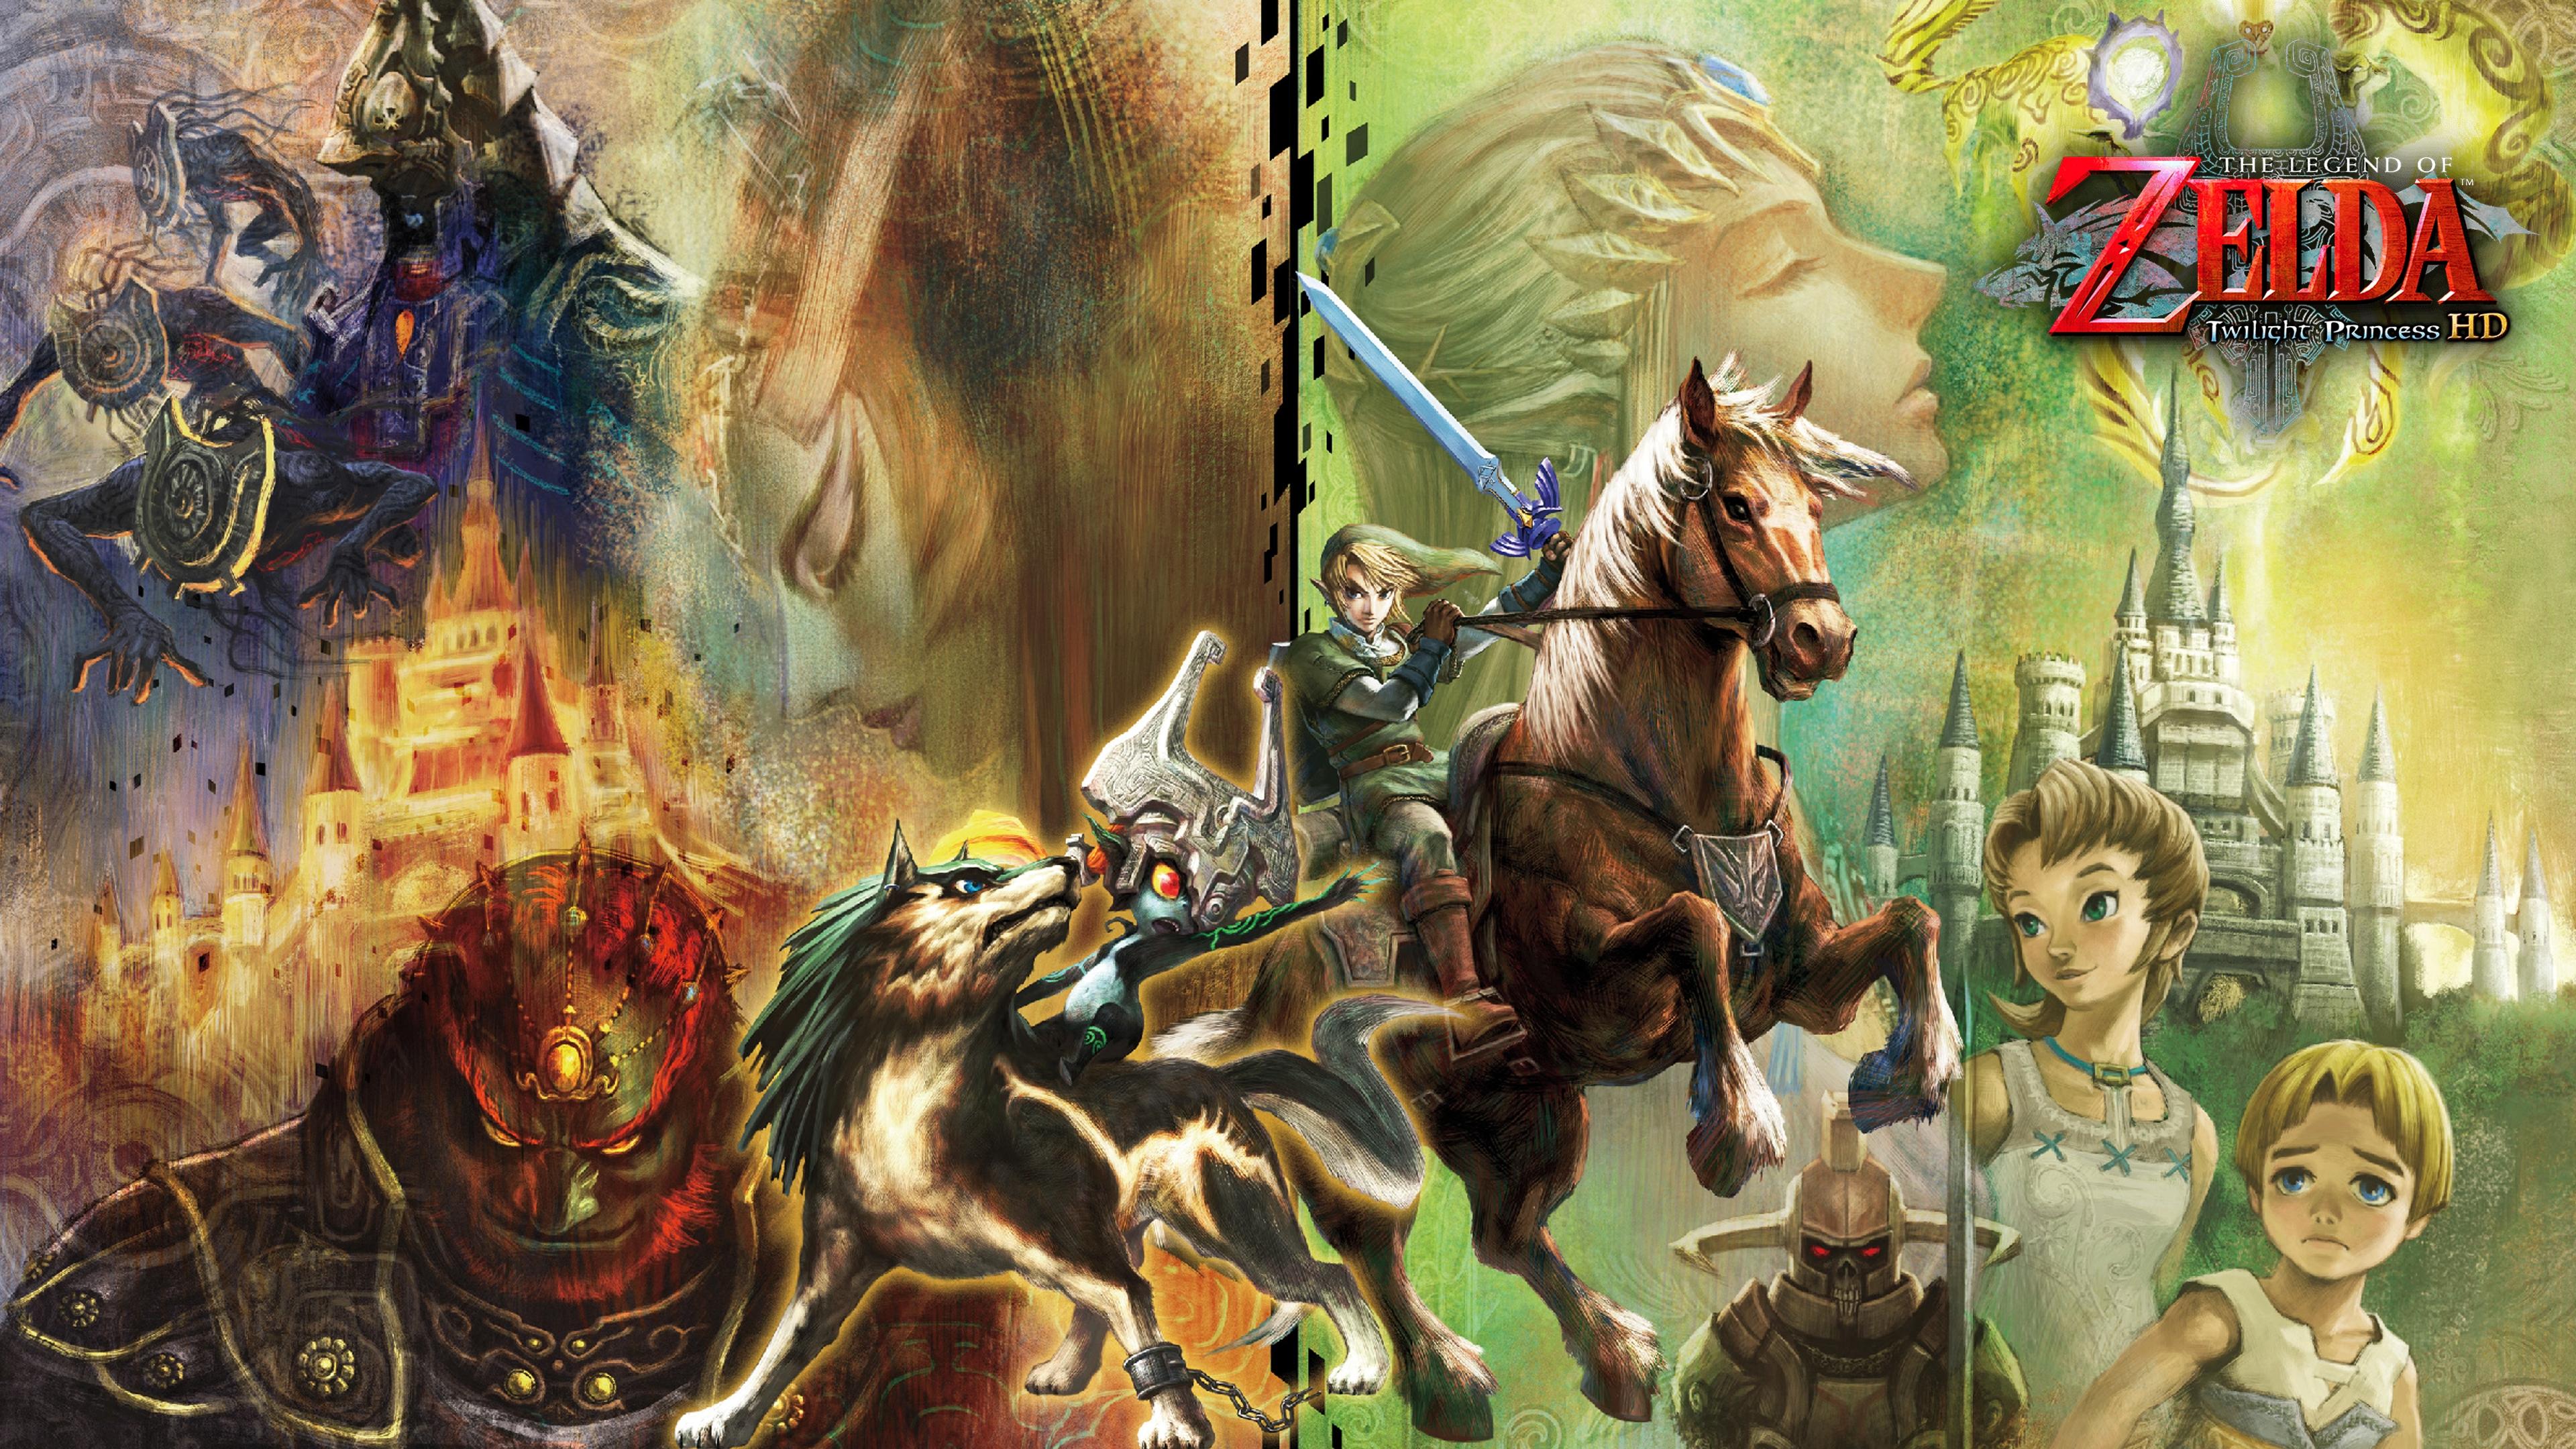 the legend of zelda: twilight princess hd 4k wallpaper 4k ultra hd